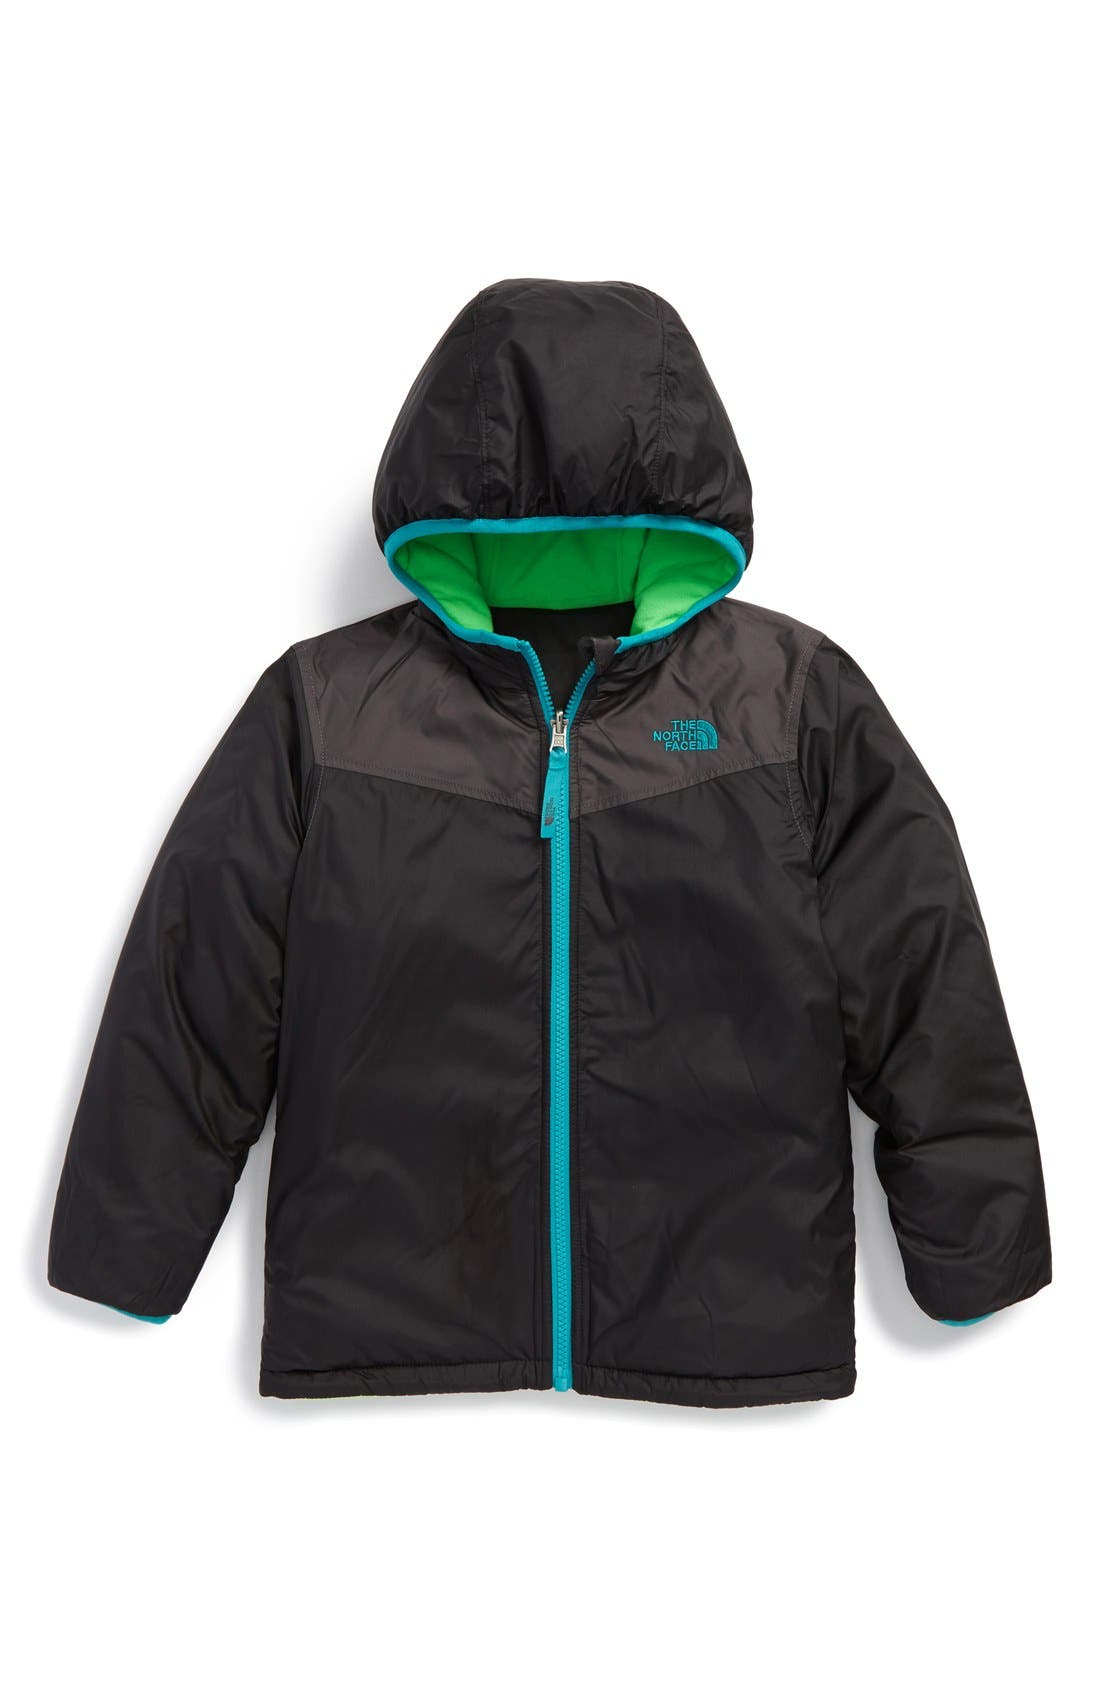 Alternate Image 2  - The North Face 'True or False' Reversible Water Resistant Jacket (Toddler Boys & Little Boys)